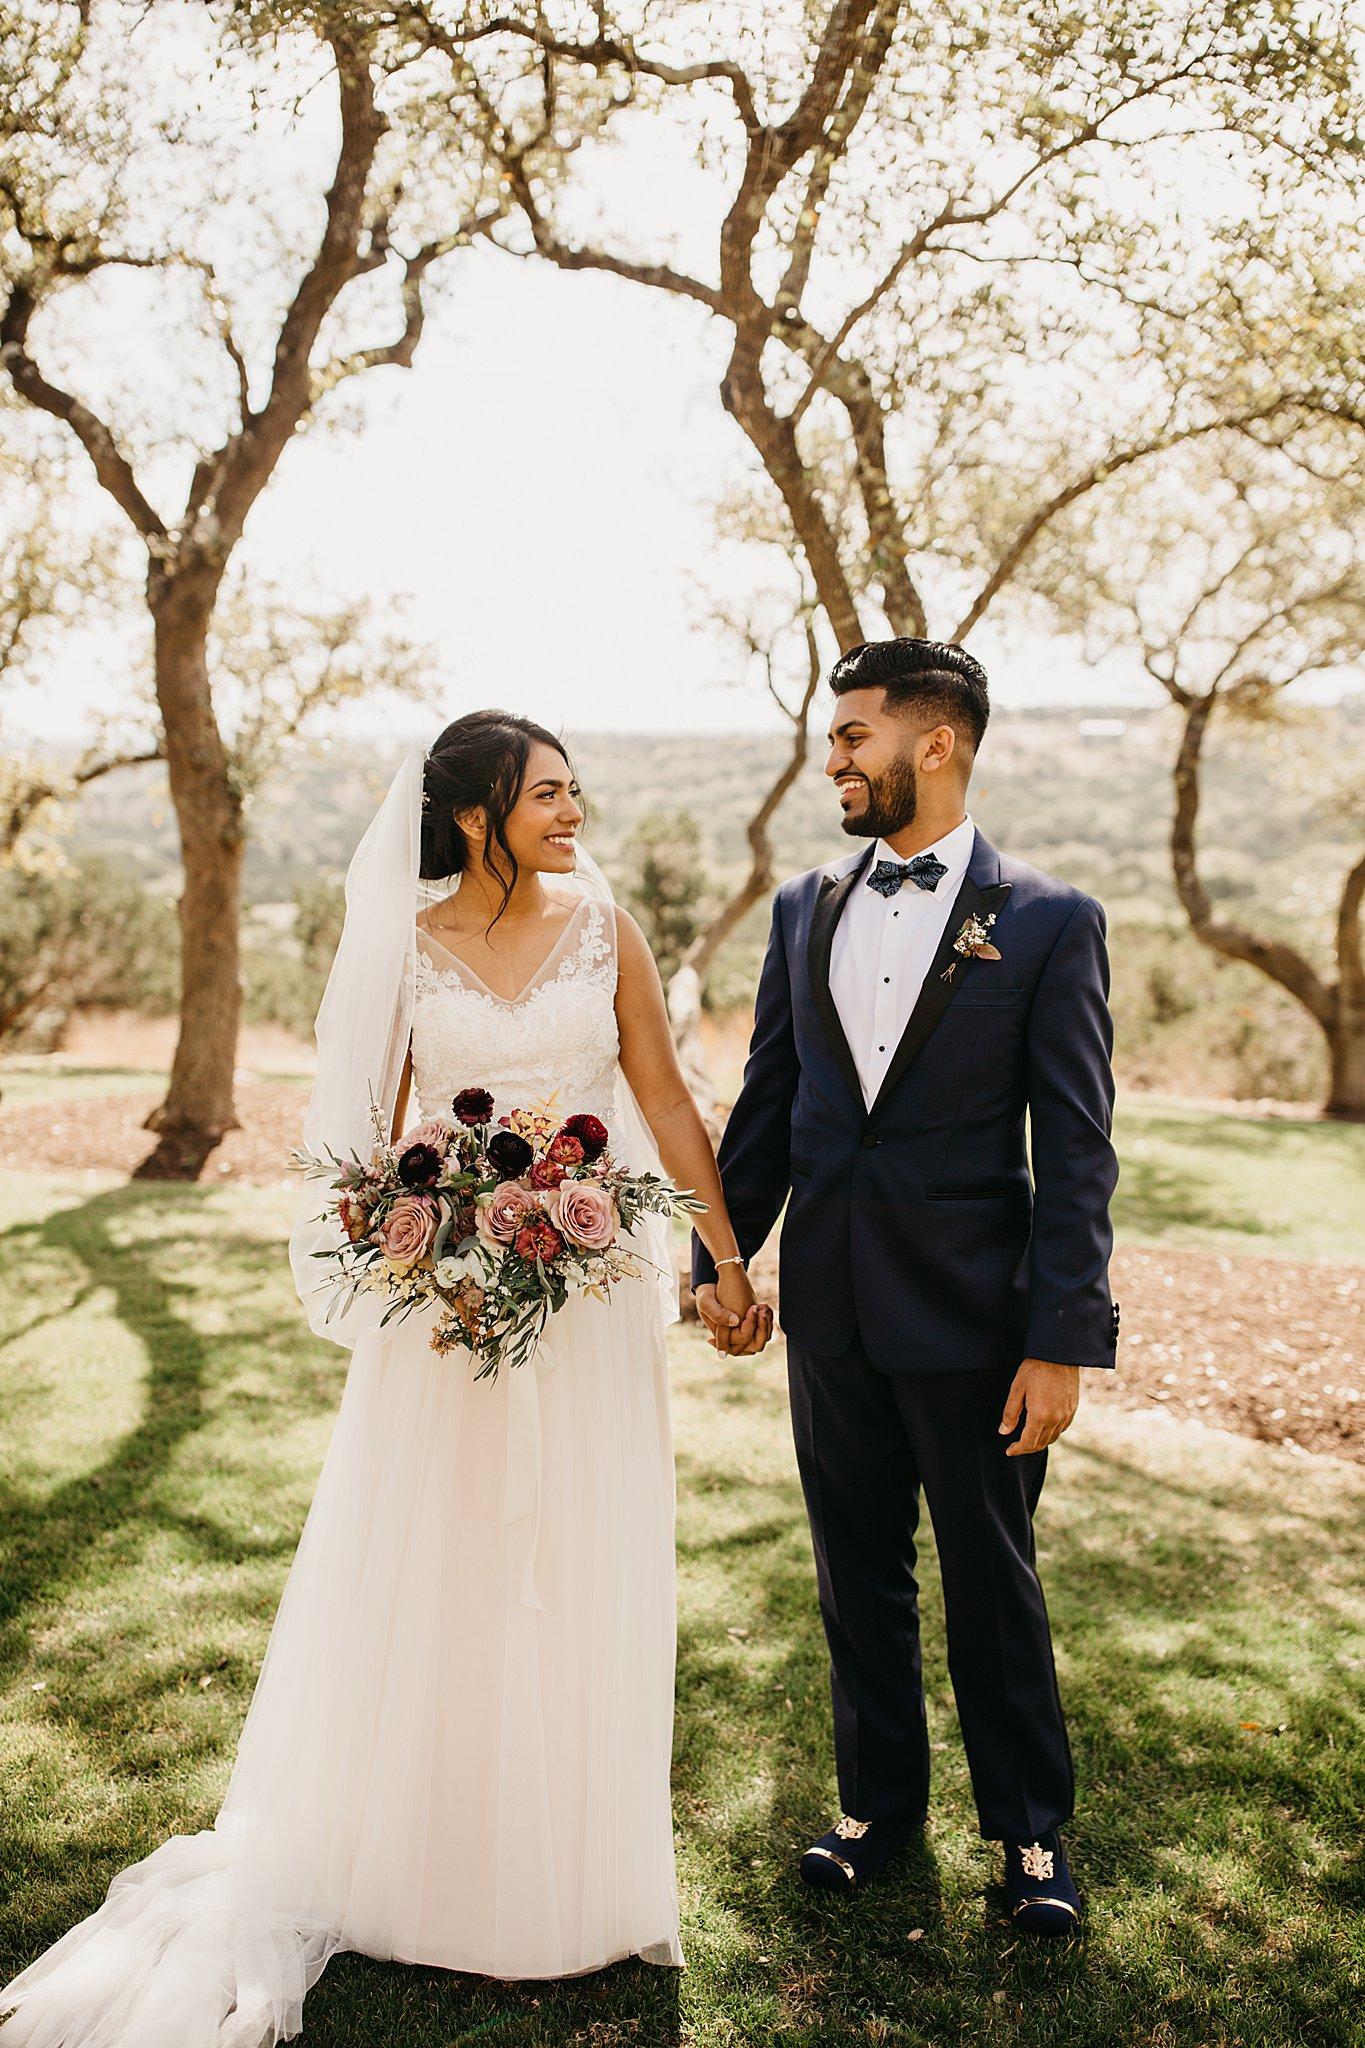 Wilderlove Co_Dripping Springs Texas_Texas Hill Country Wedding_Photography_0055.jpg